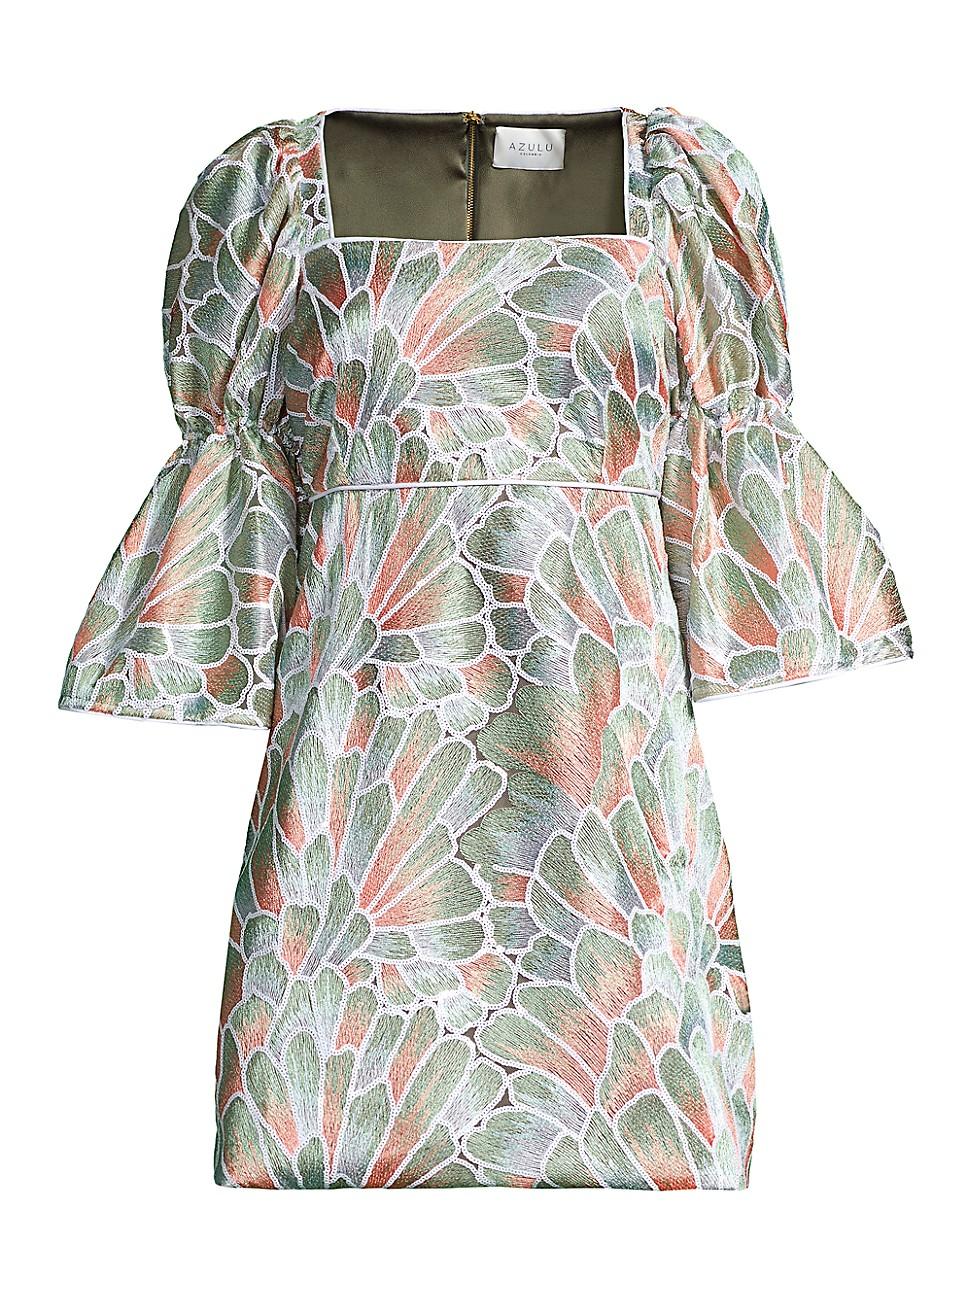 Azulu WOMEN'S PUFF WIDE-SLEEVE DRESS